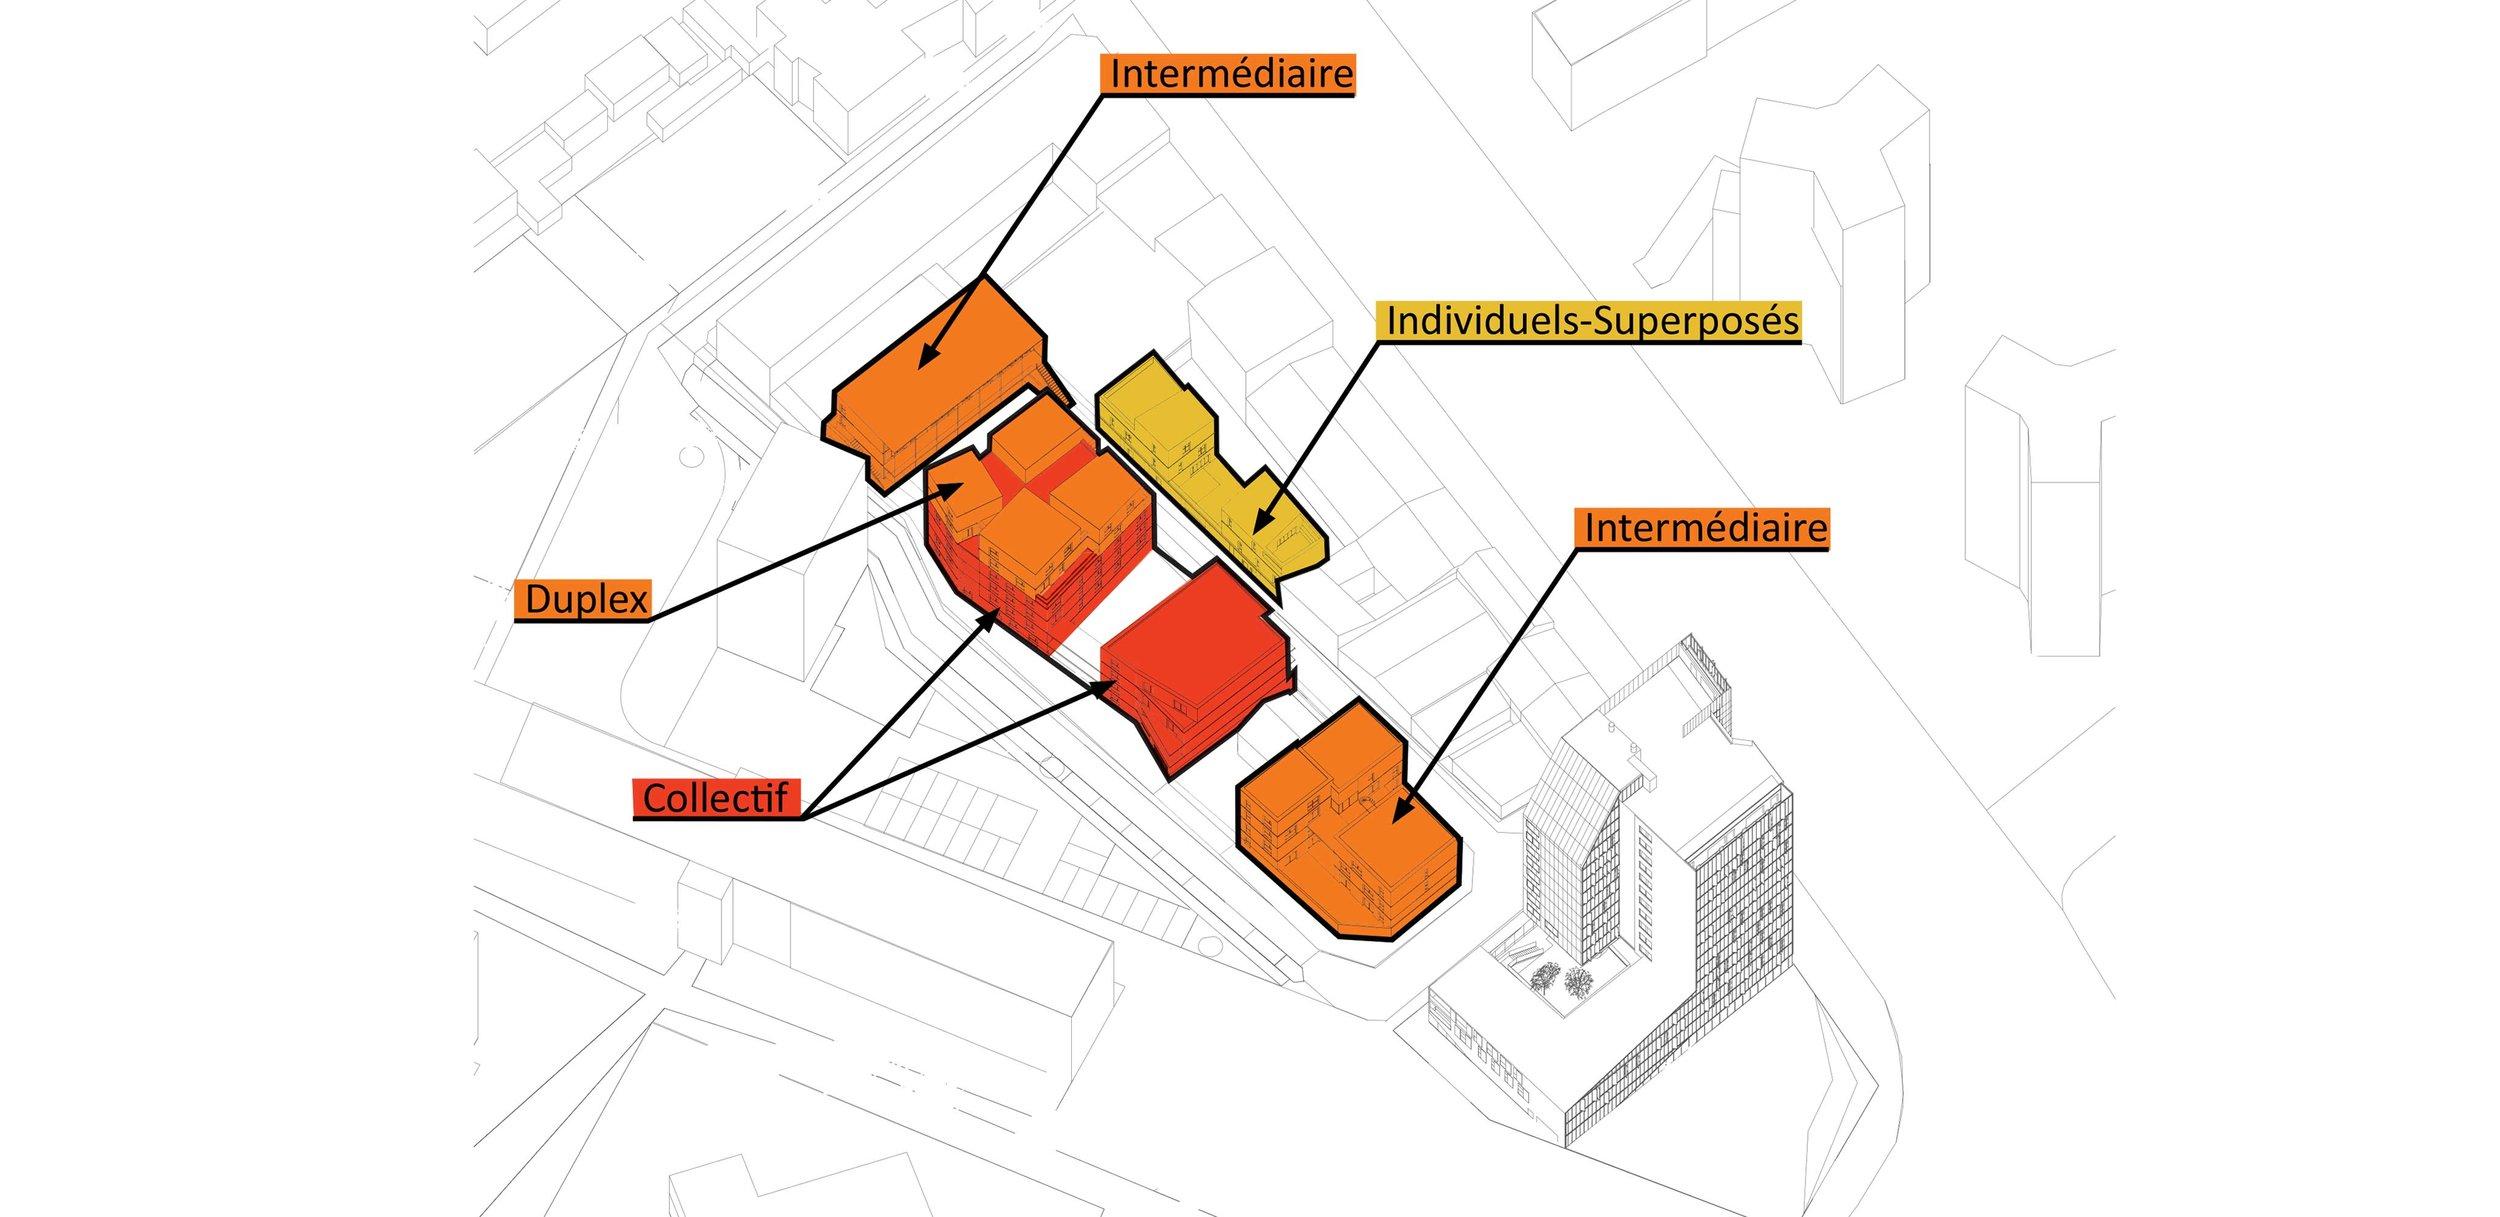 Aubervilliers-Axonometrie-03.jpg